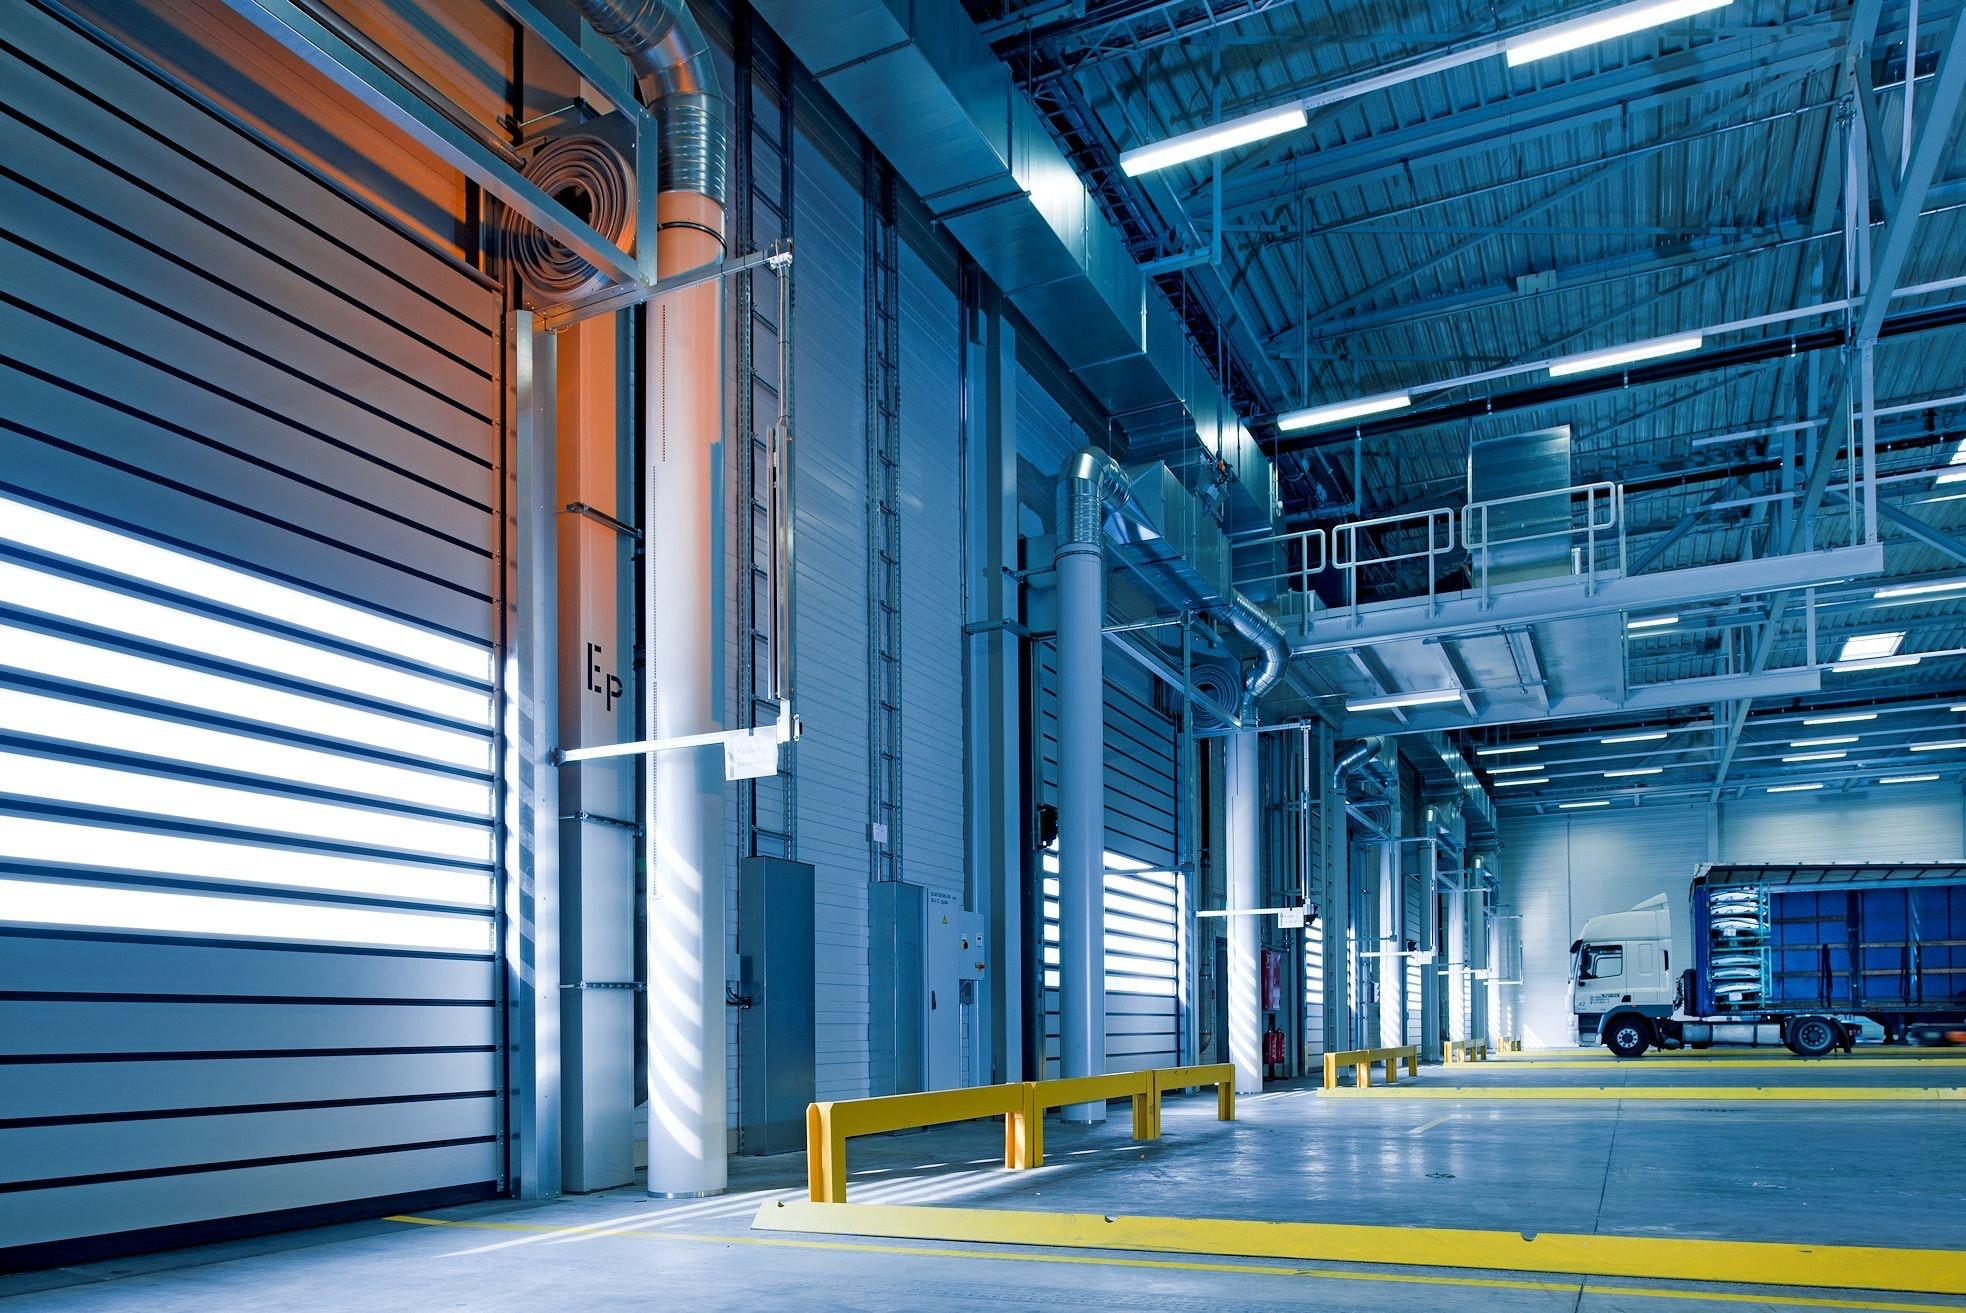 industrial warehouse garage area